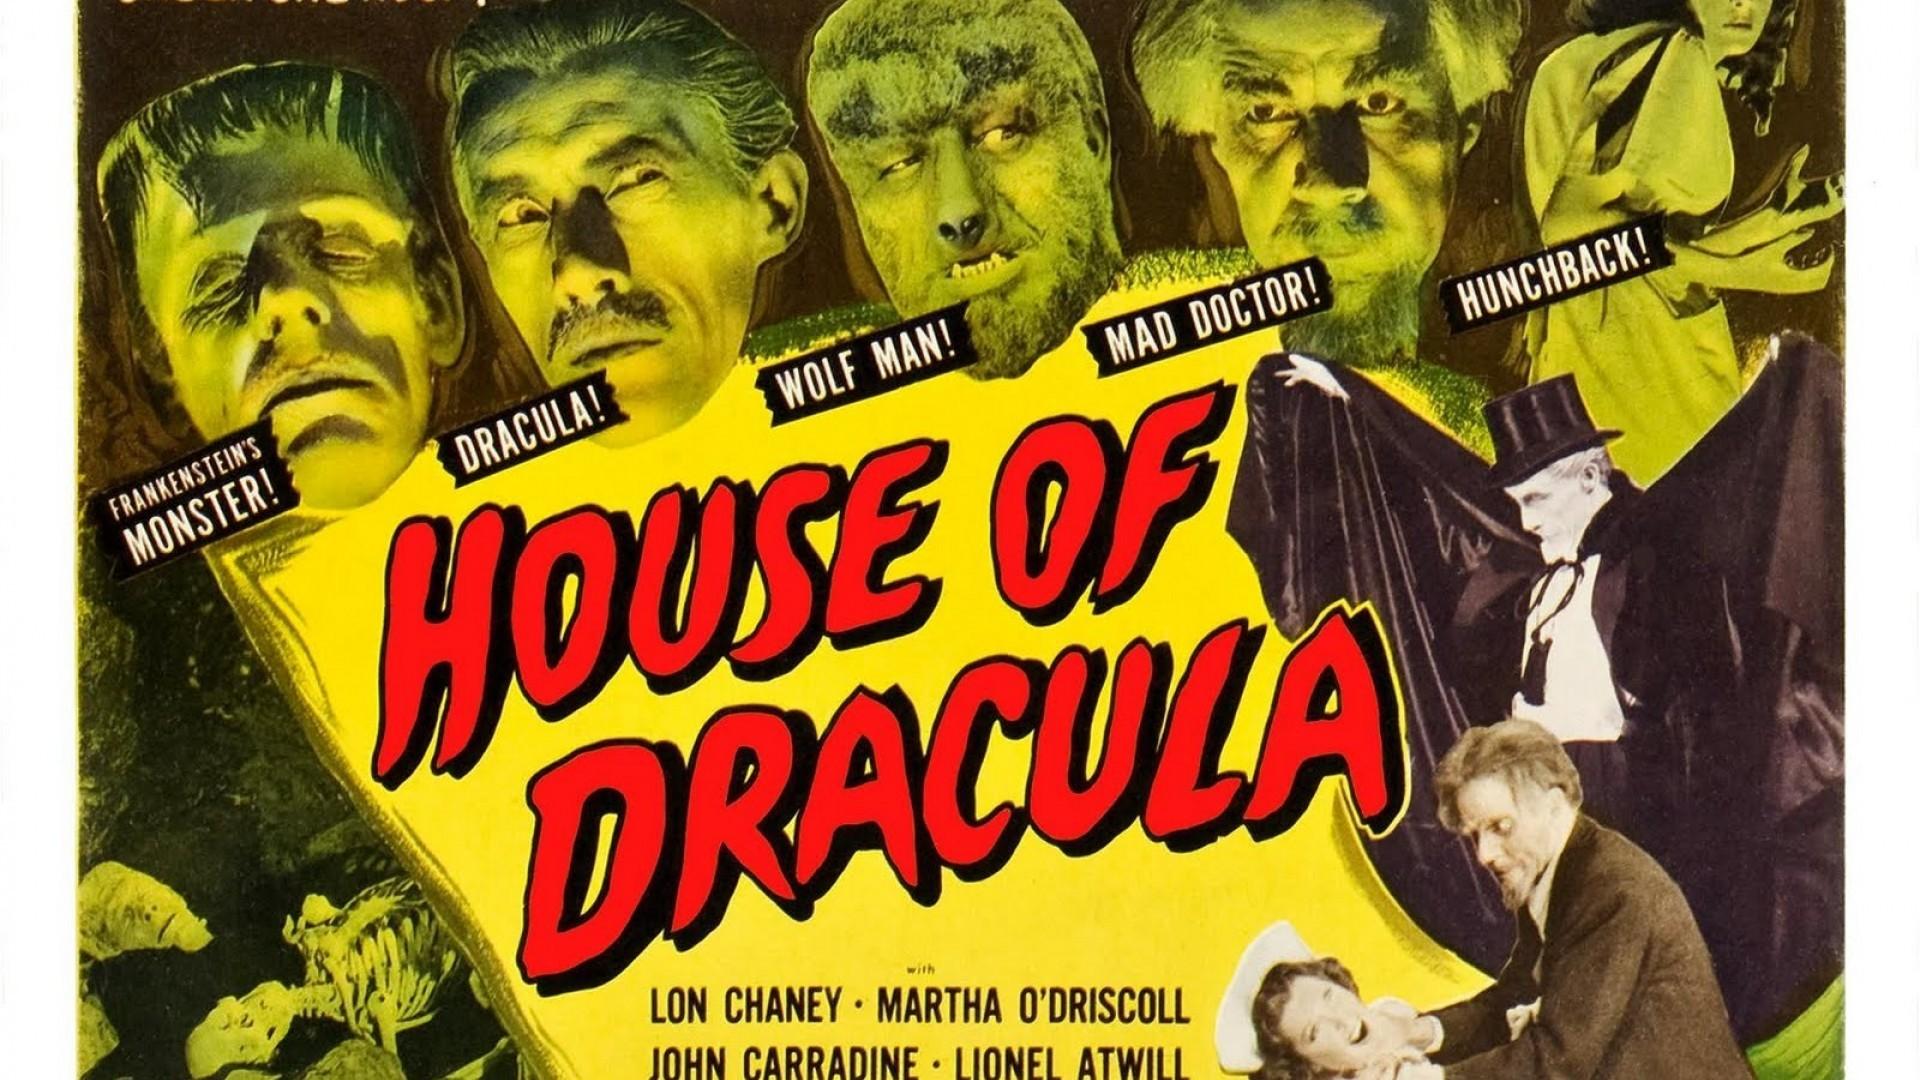 Classic Horror Movie Posters Dracula Horror vintage dracula movie